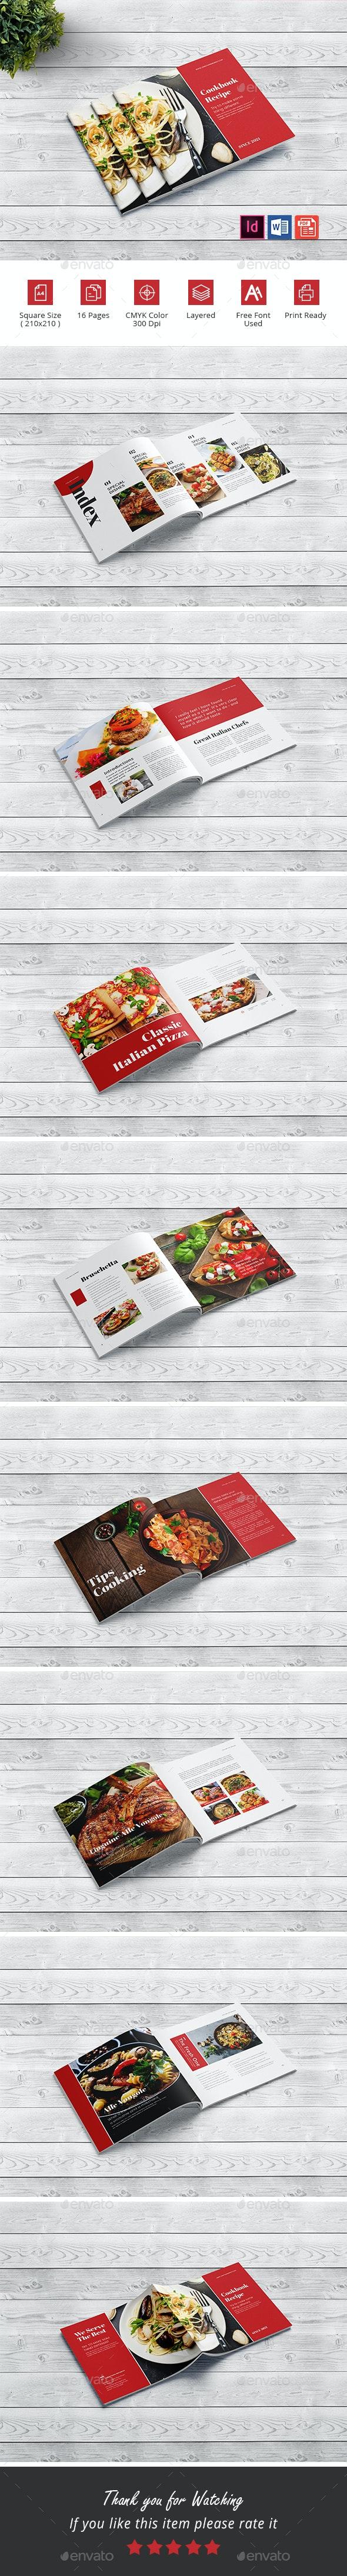 Square Cookbook Brochure - Food Menus Print Templates